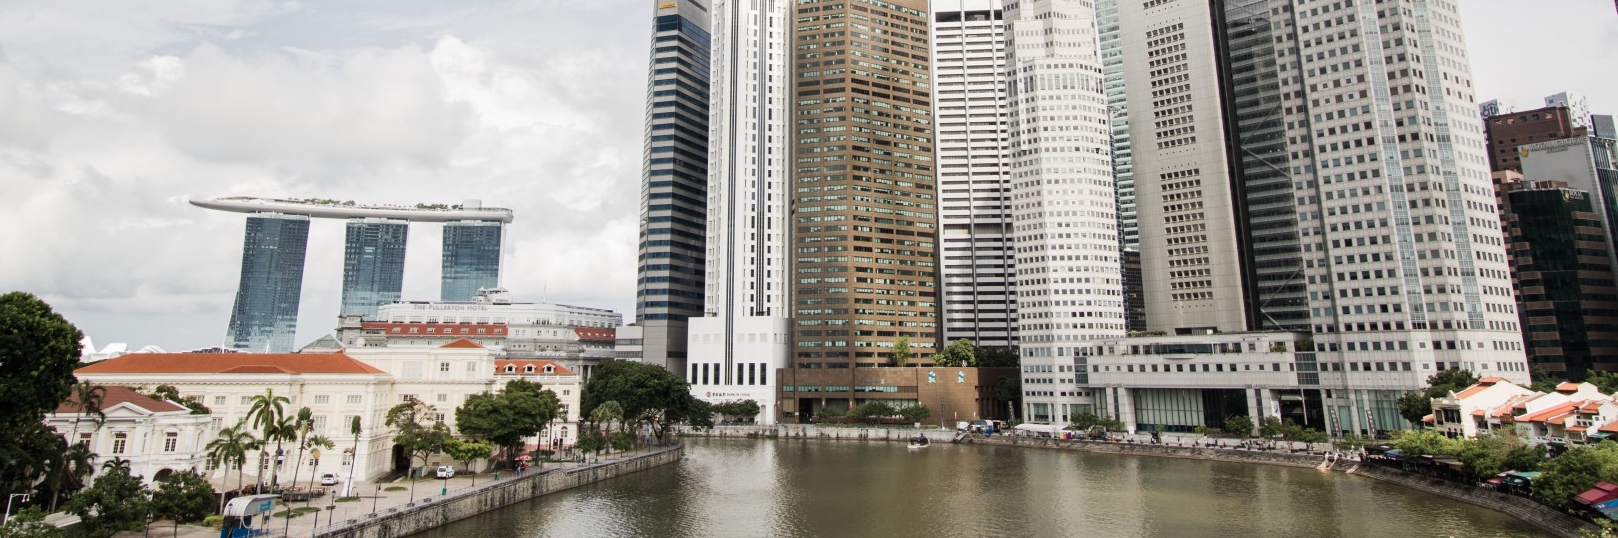 Singapore South Bridge Studio Deluxe